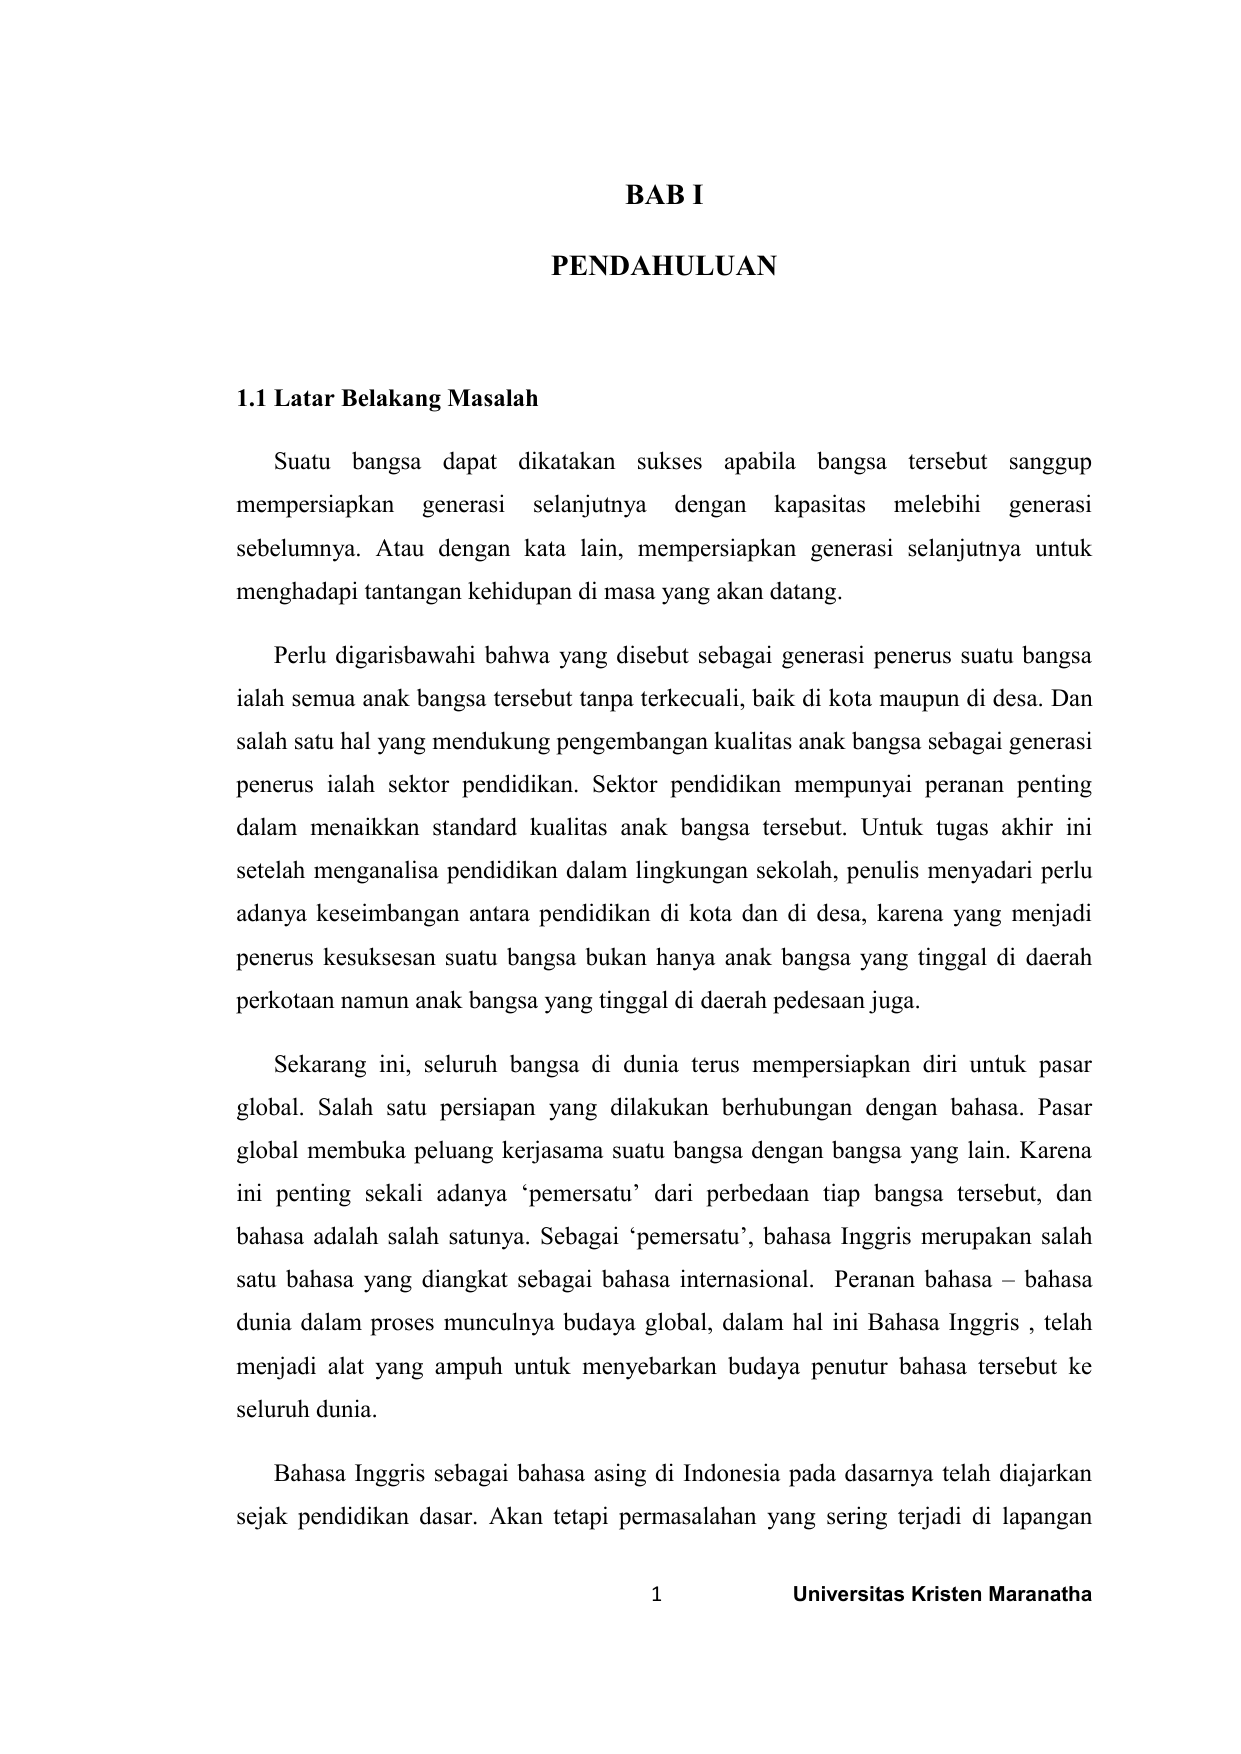 Bab I Pendahuluan Repository Maranatha